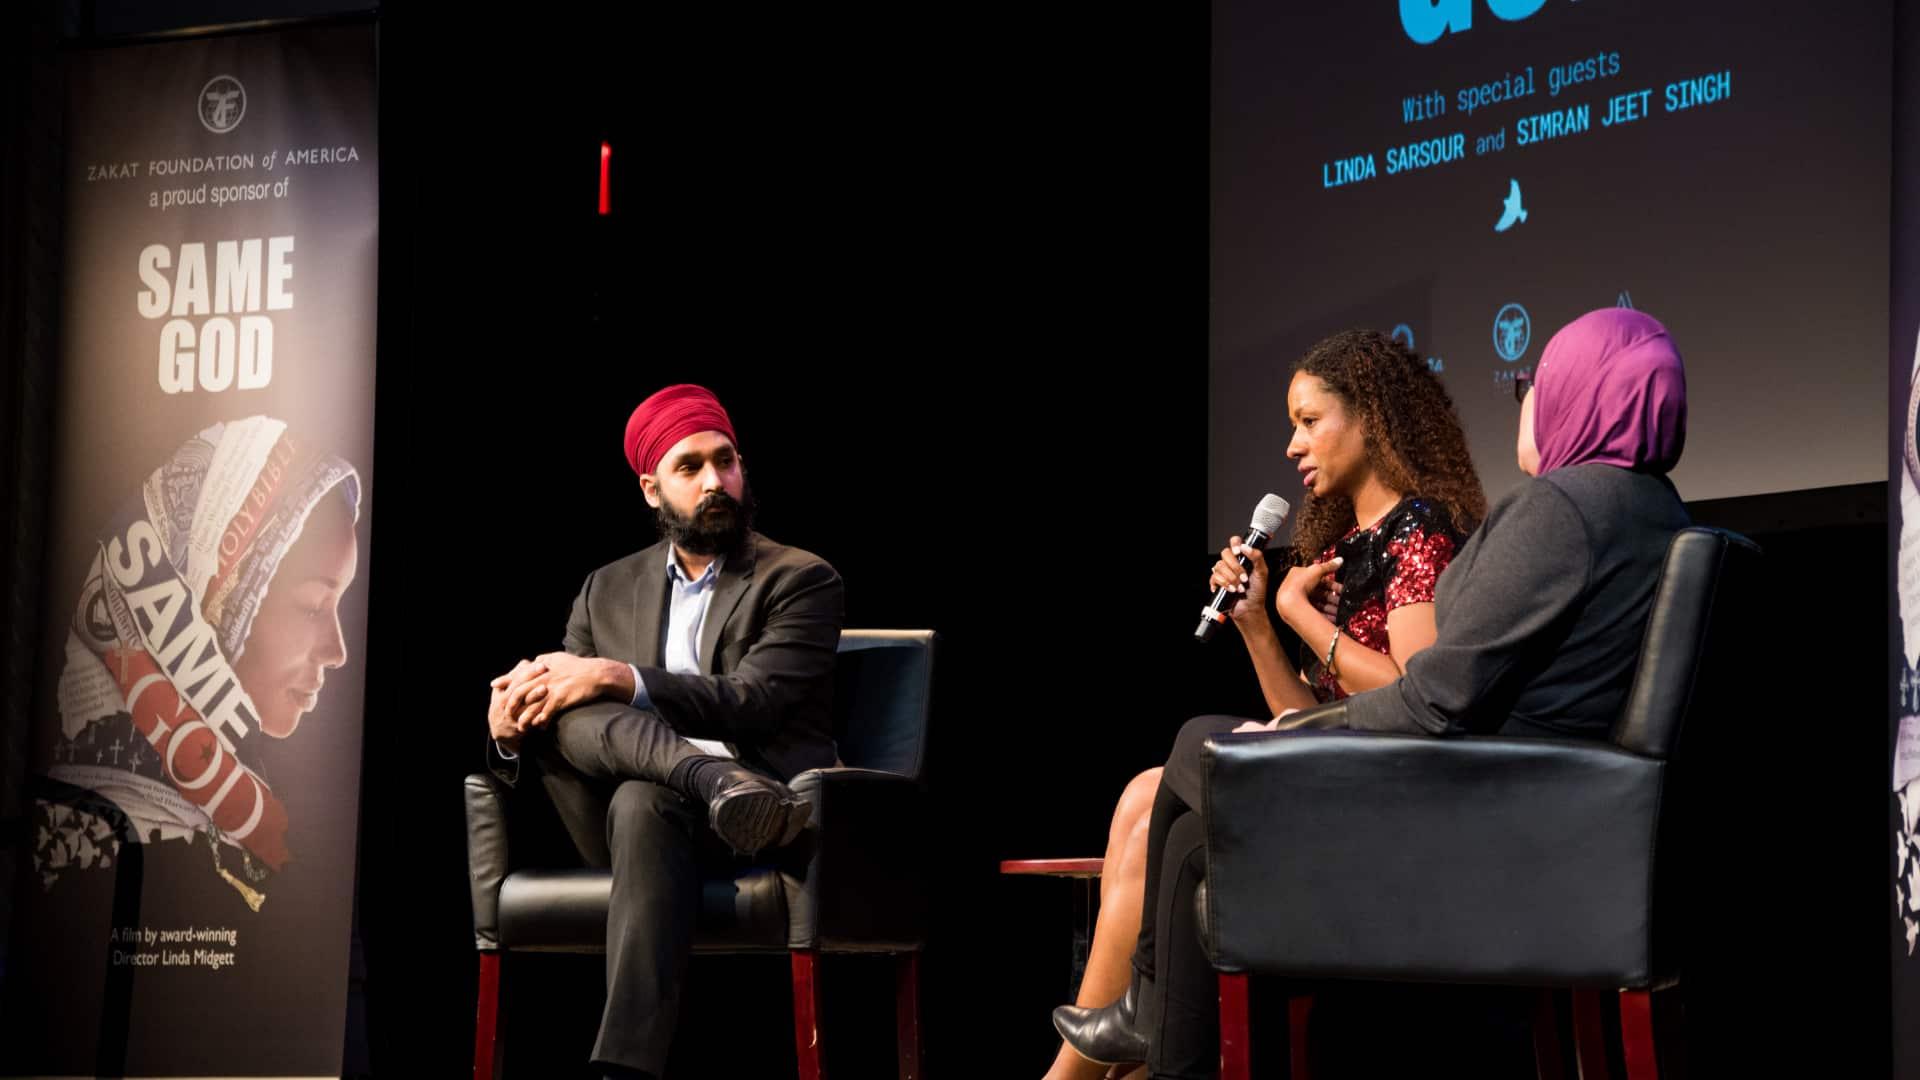 Linda Sarsour and Simran Jeet Singh talking at a panel